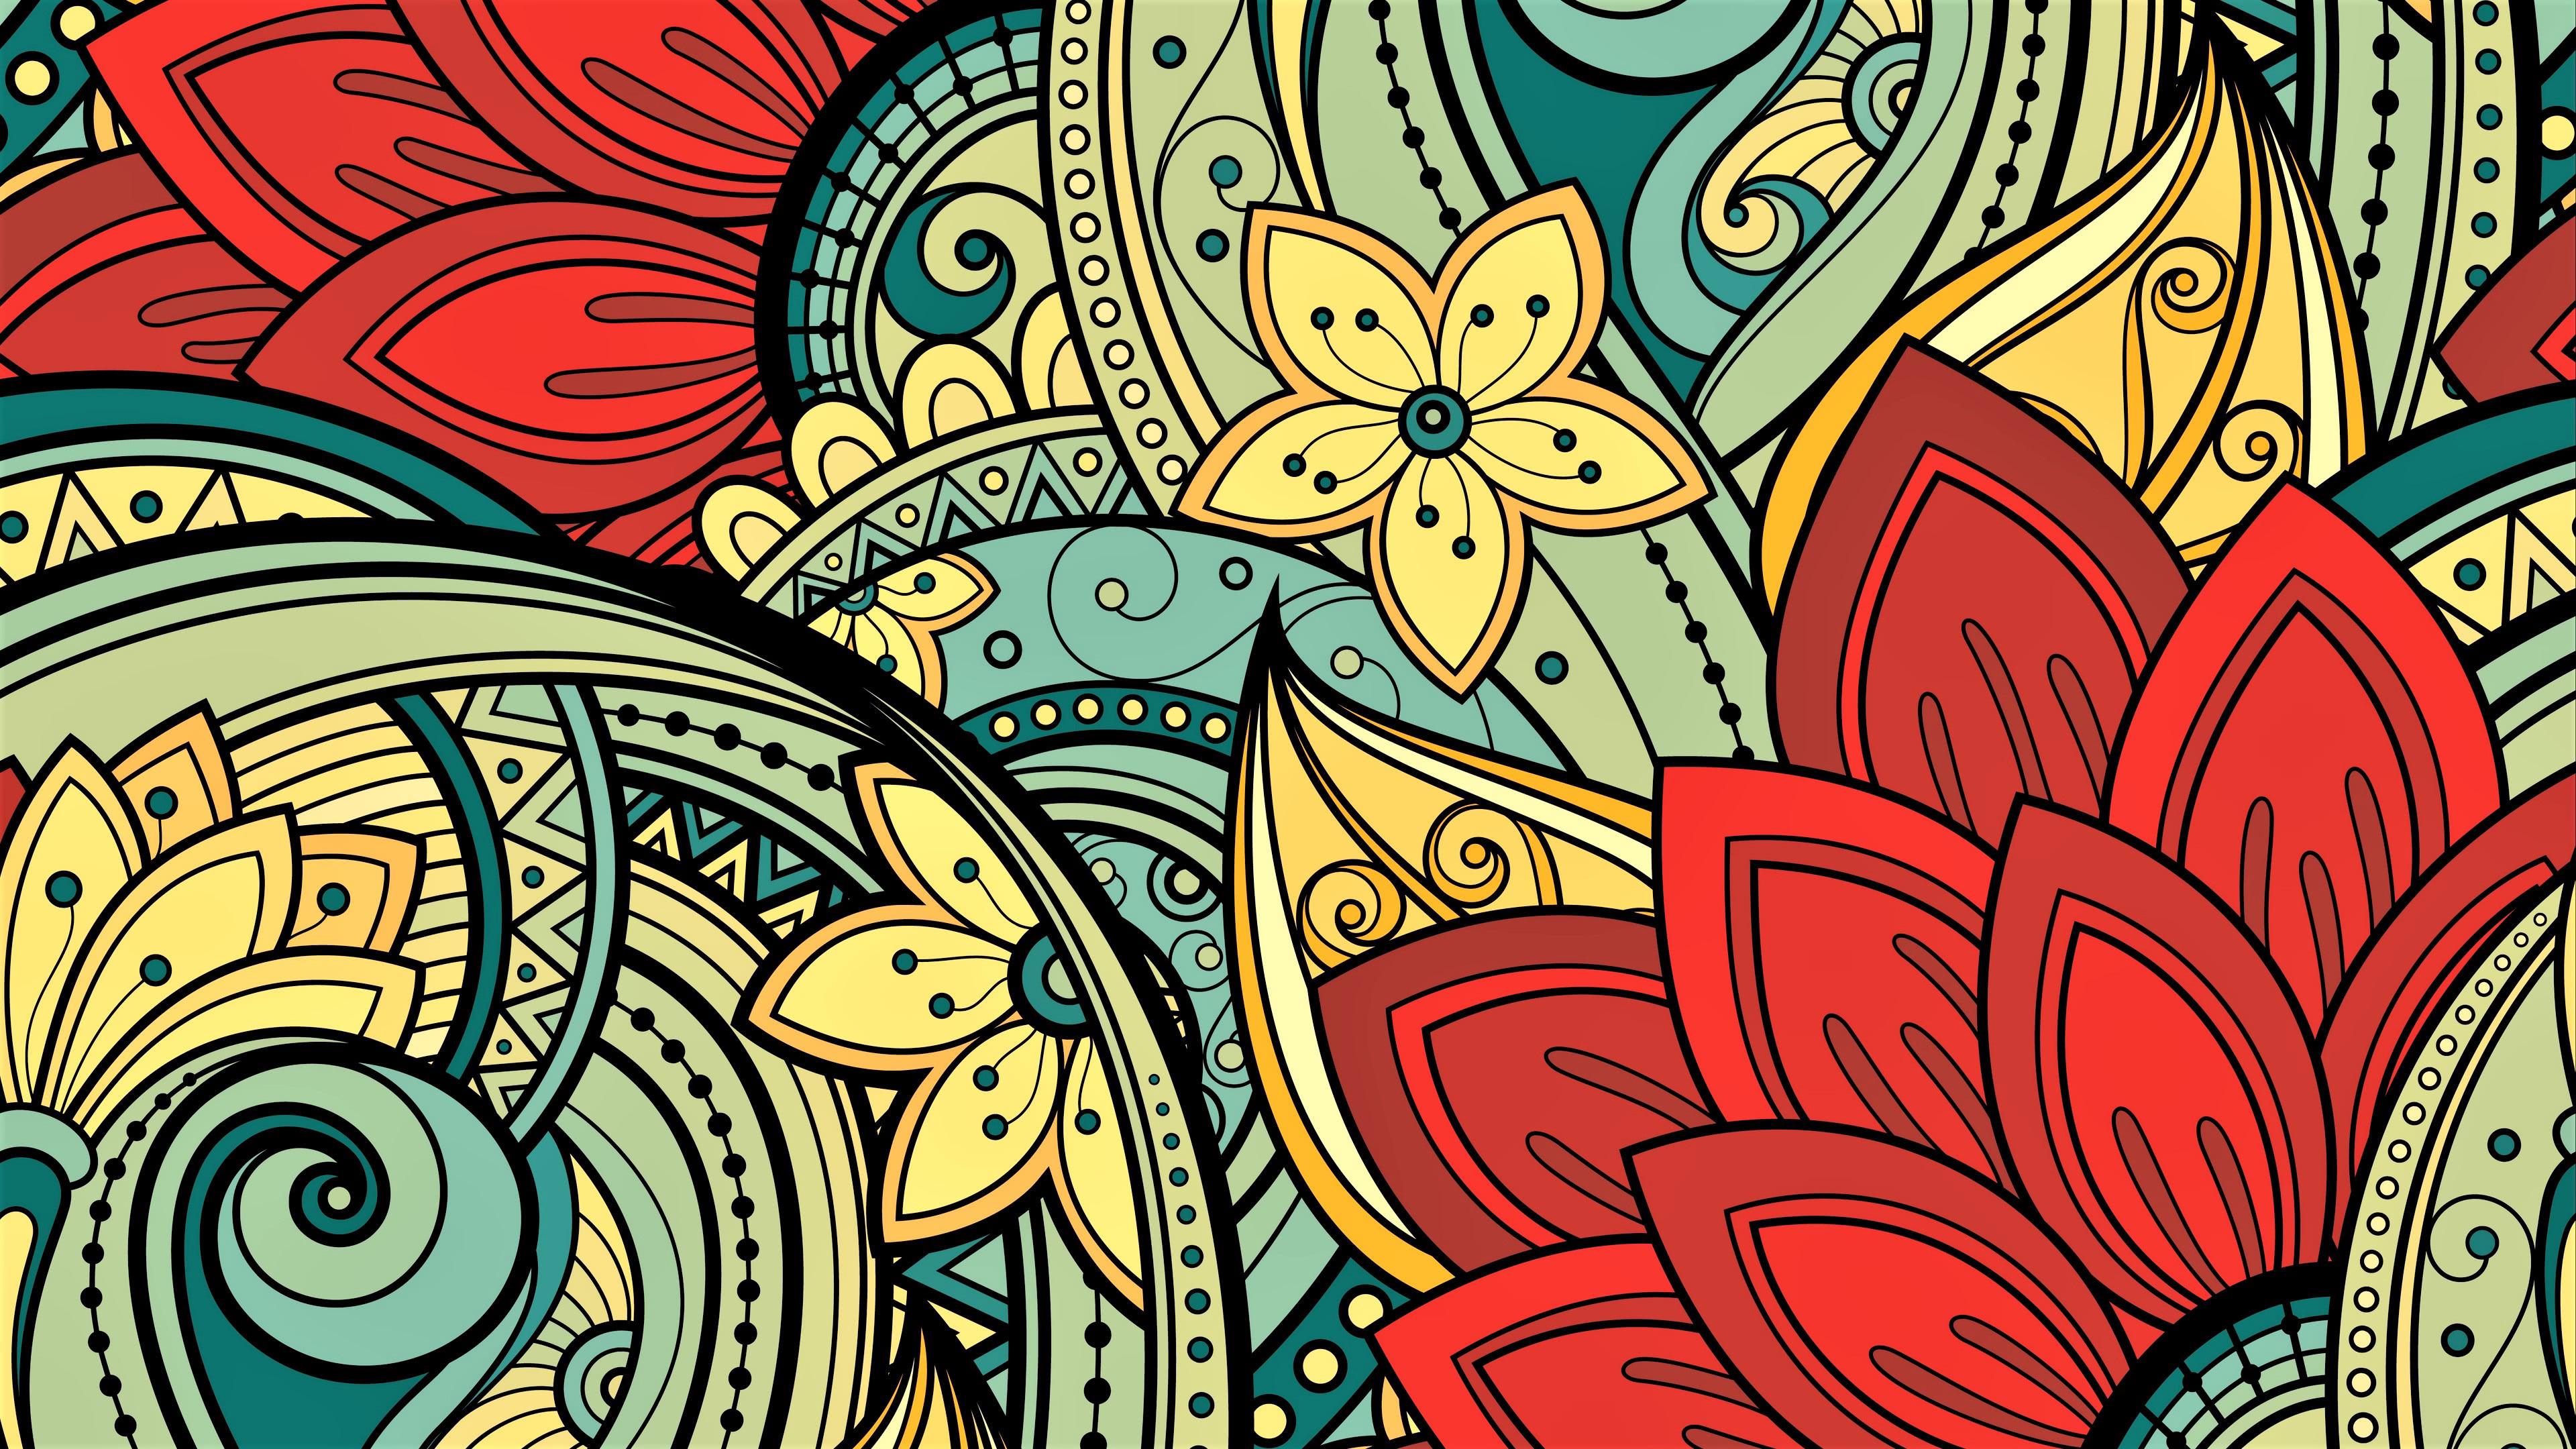 floral art pattern uhd 4k wallpaper